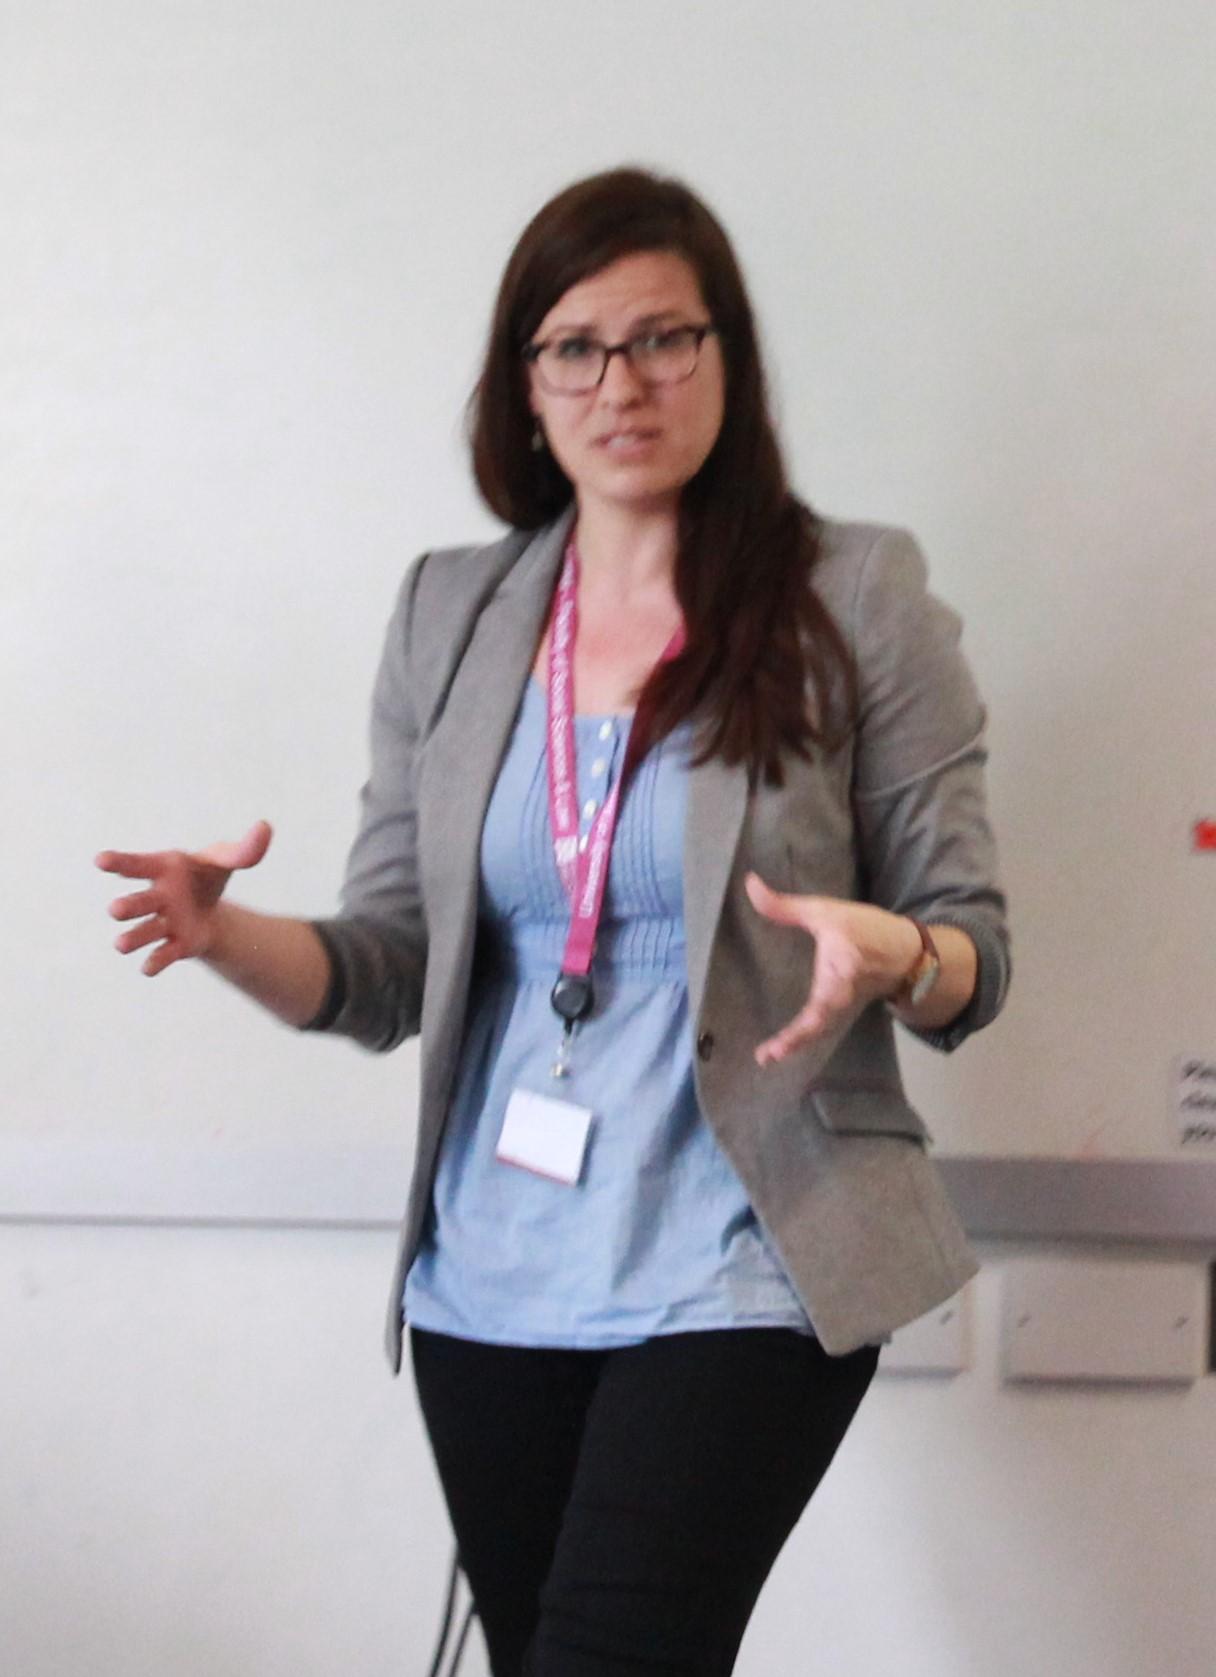 Dr Leanne Cameron